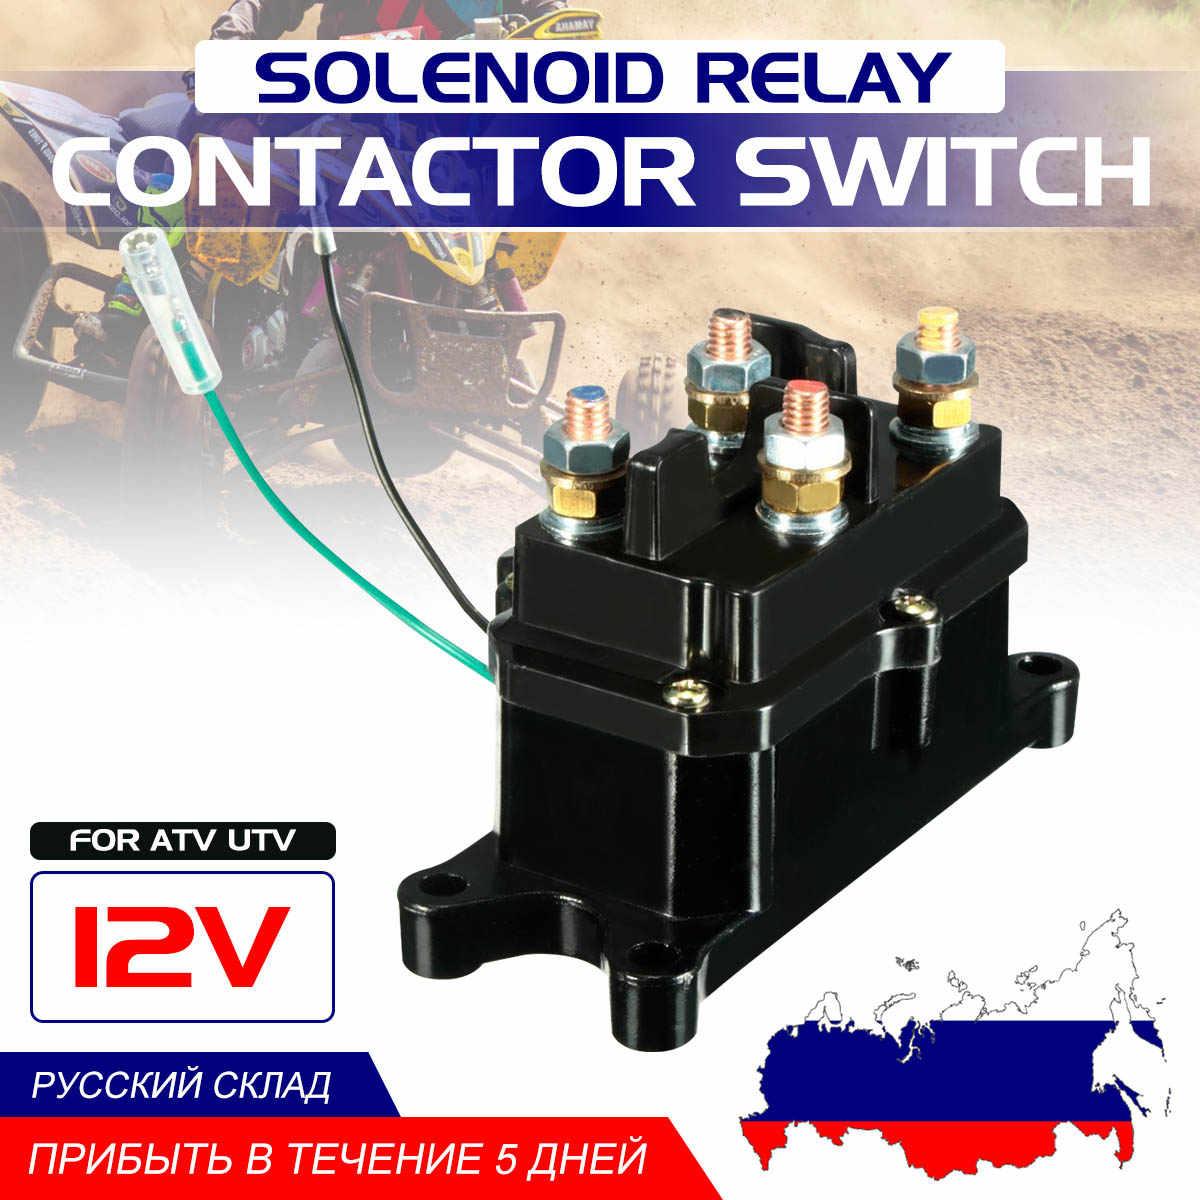 universal 12v solenoid relay contactor winch rocker switch thumb for atv utv [ 1200 x 1200 Pixel ]